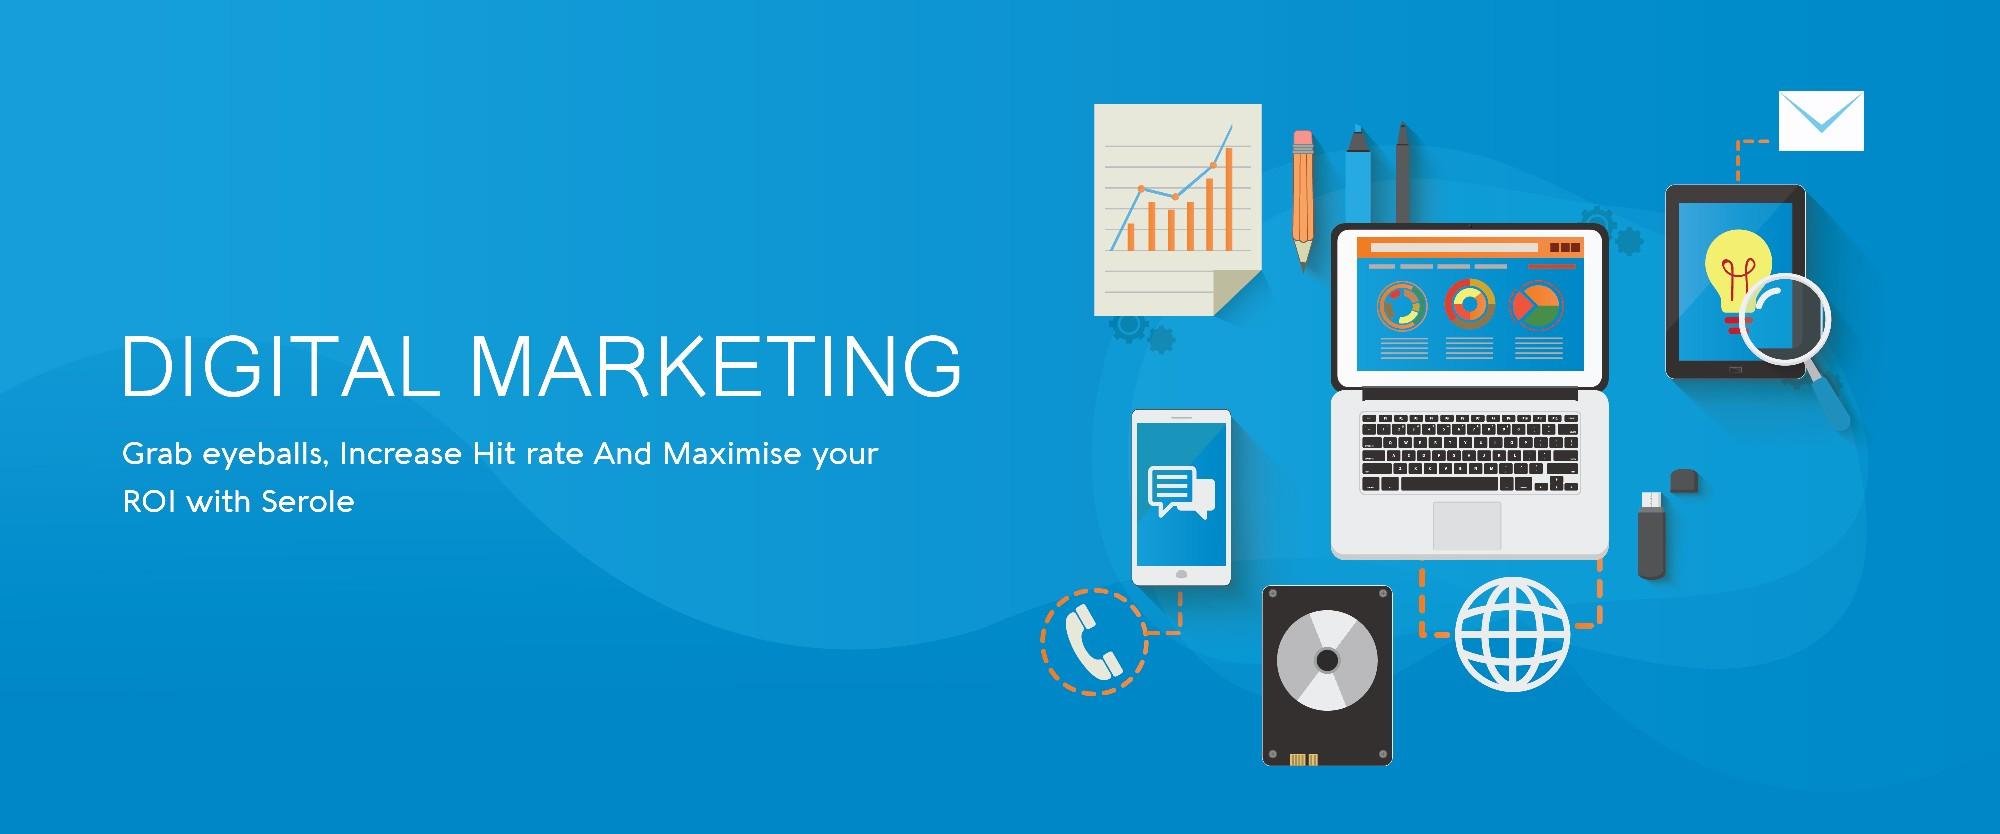 2.Digital Marketing-01